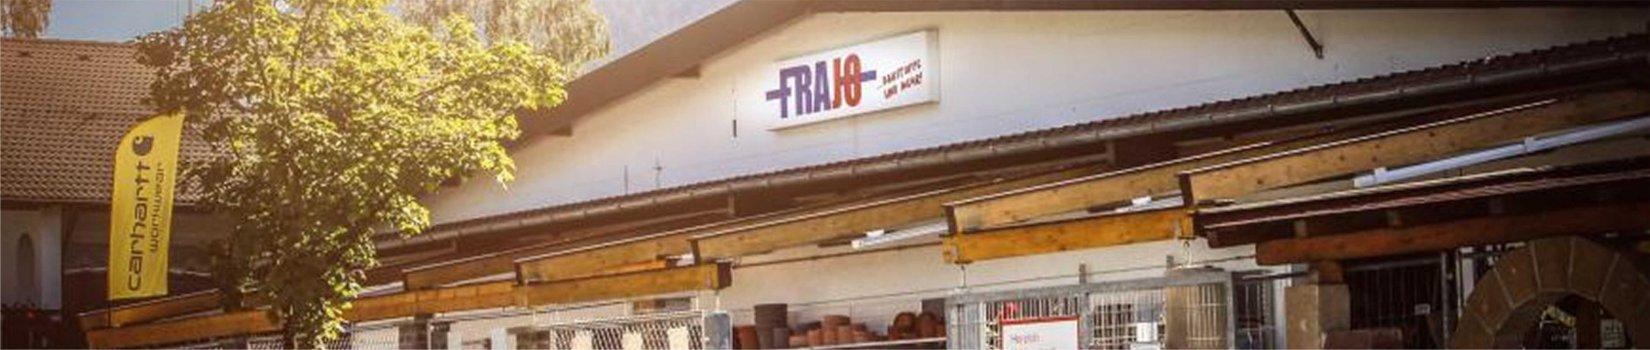 Baustoffe FRAJO GmbH - Garmisch-Partenkirchen